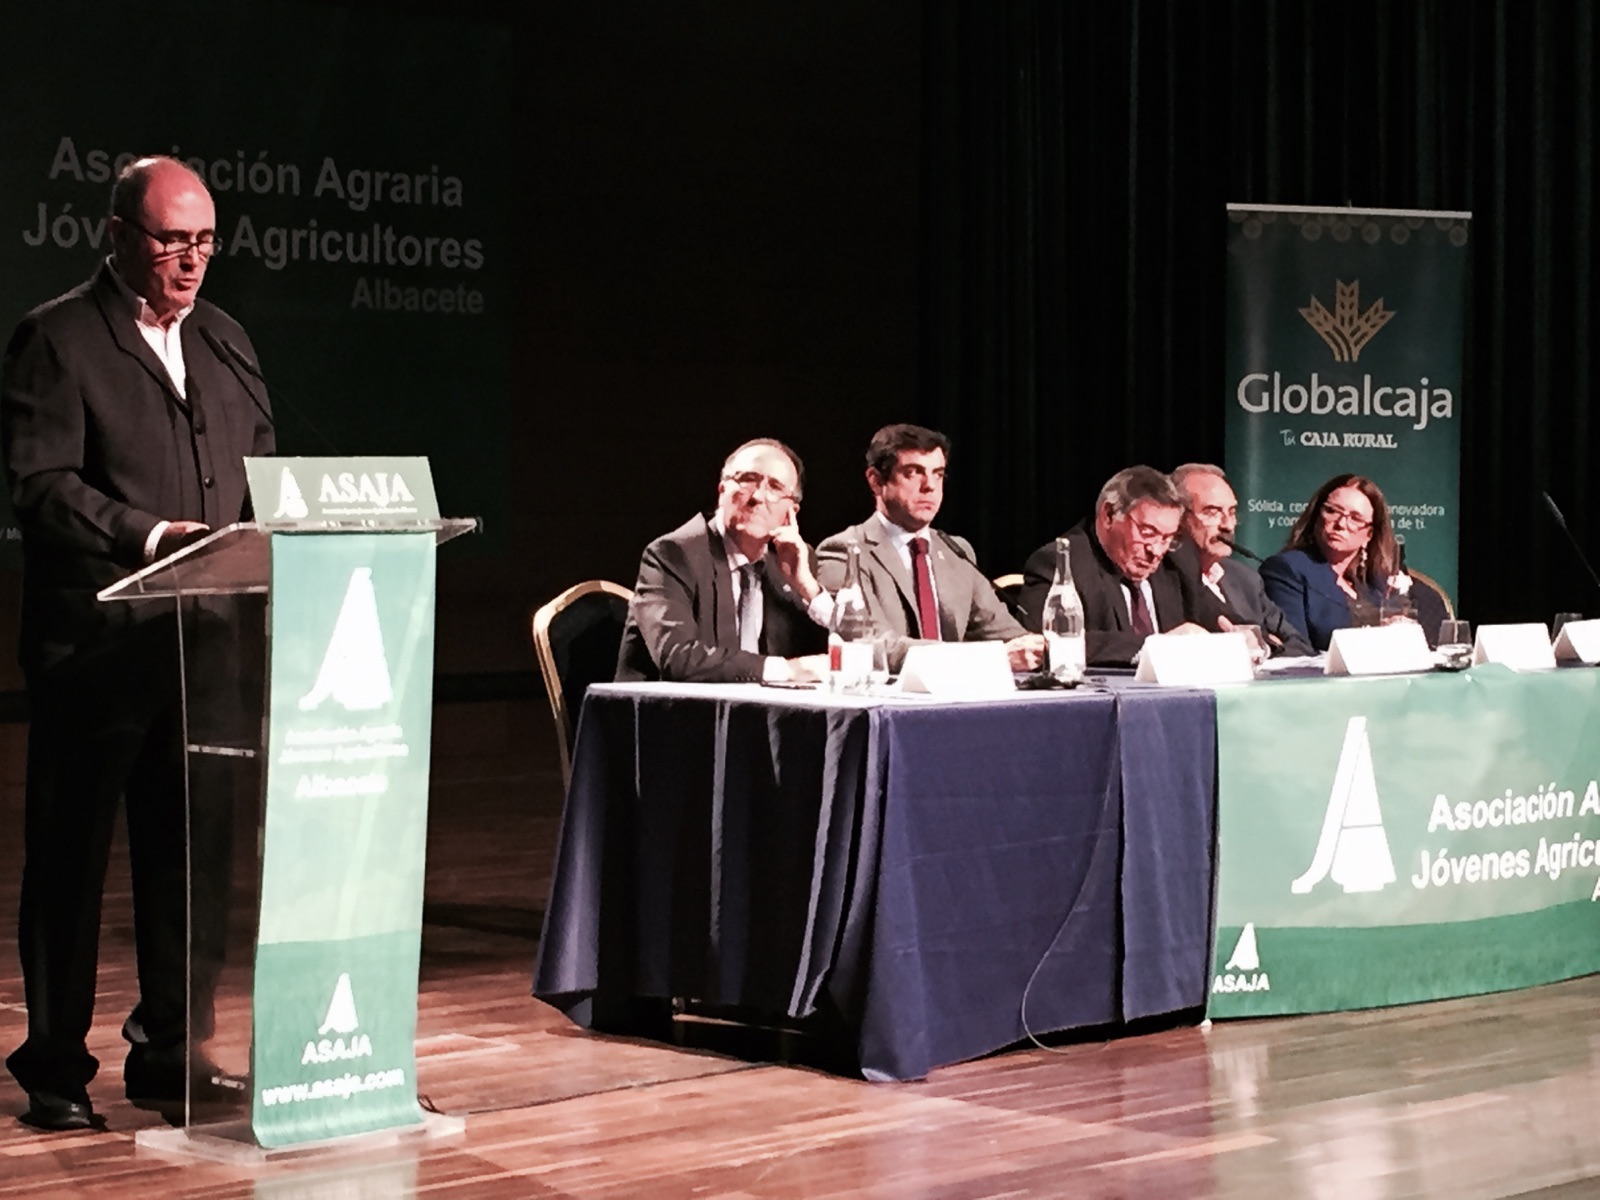 https://blog.globalcaja.es/wp-content/uploads/2015/11/asaja-albacete-2.jpg